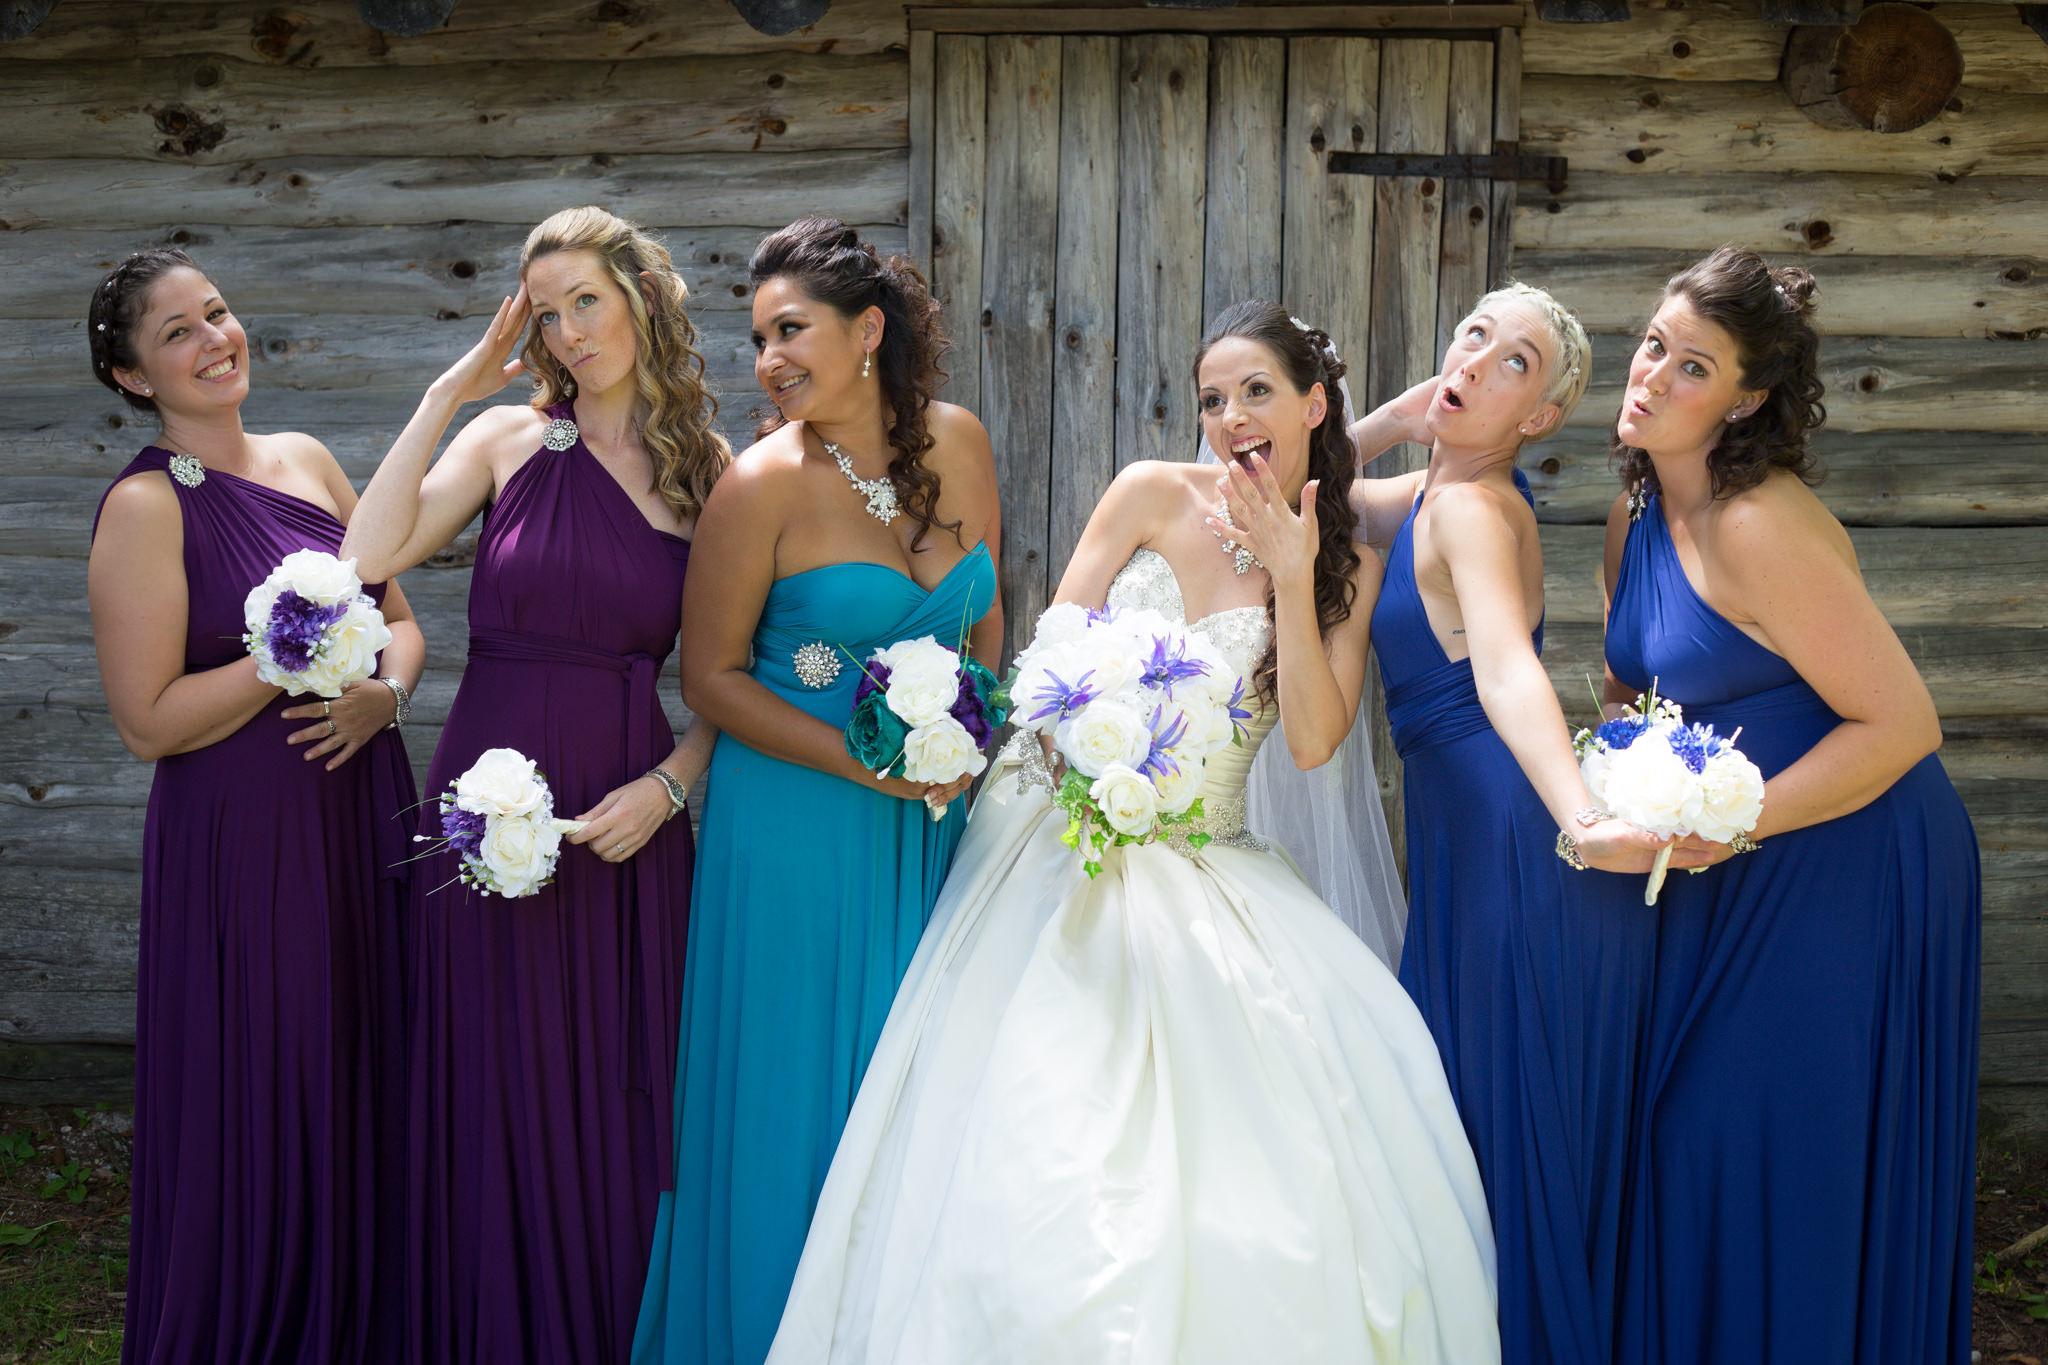 Toronto Wedding Photographer - 32 - 1748.jpg